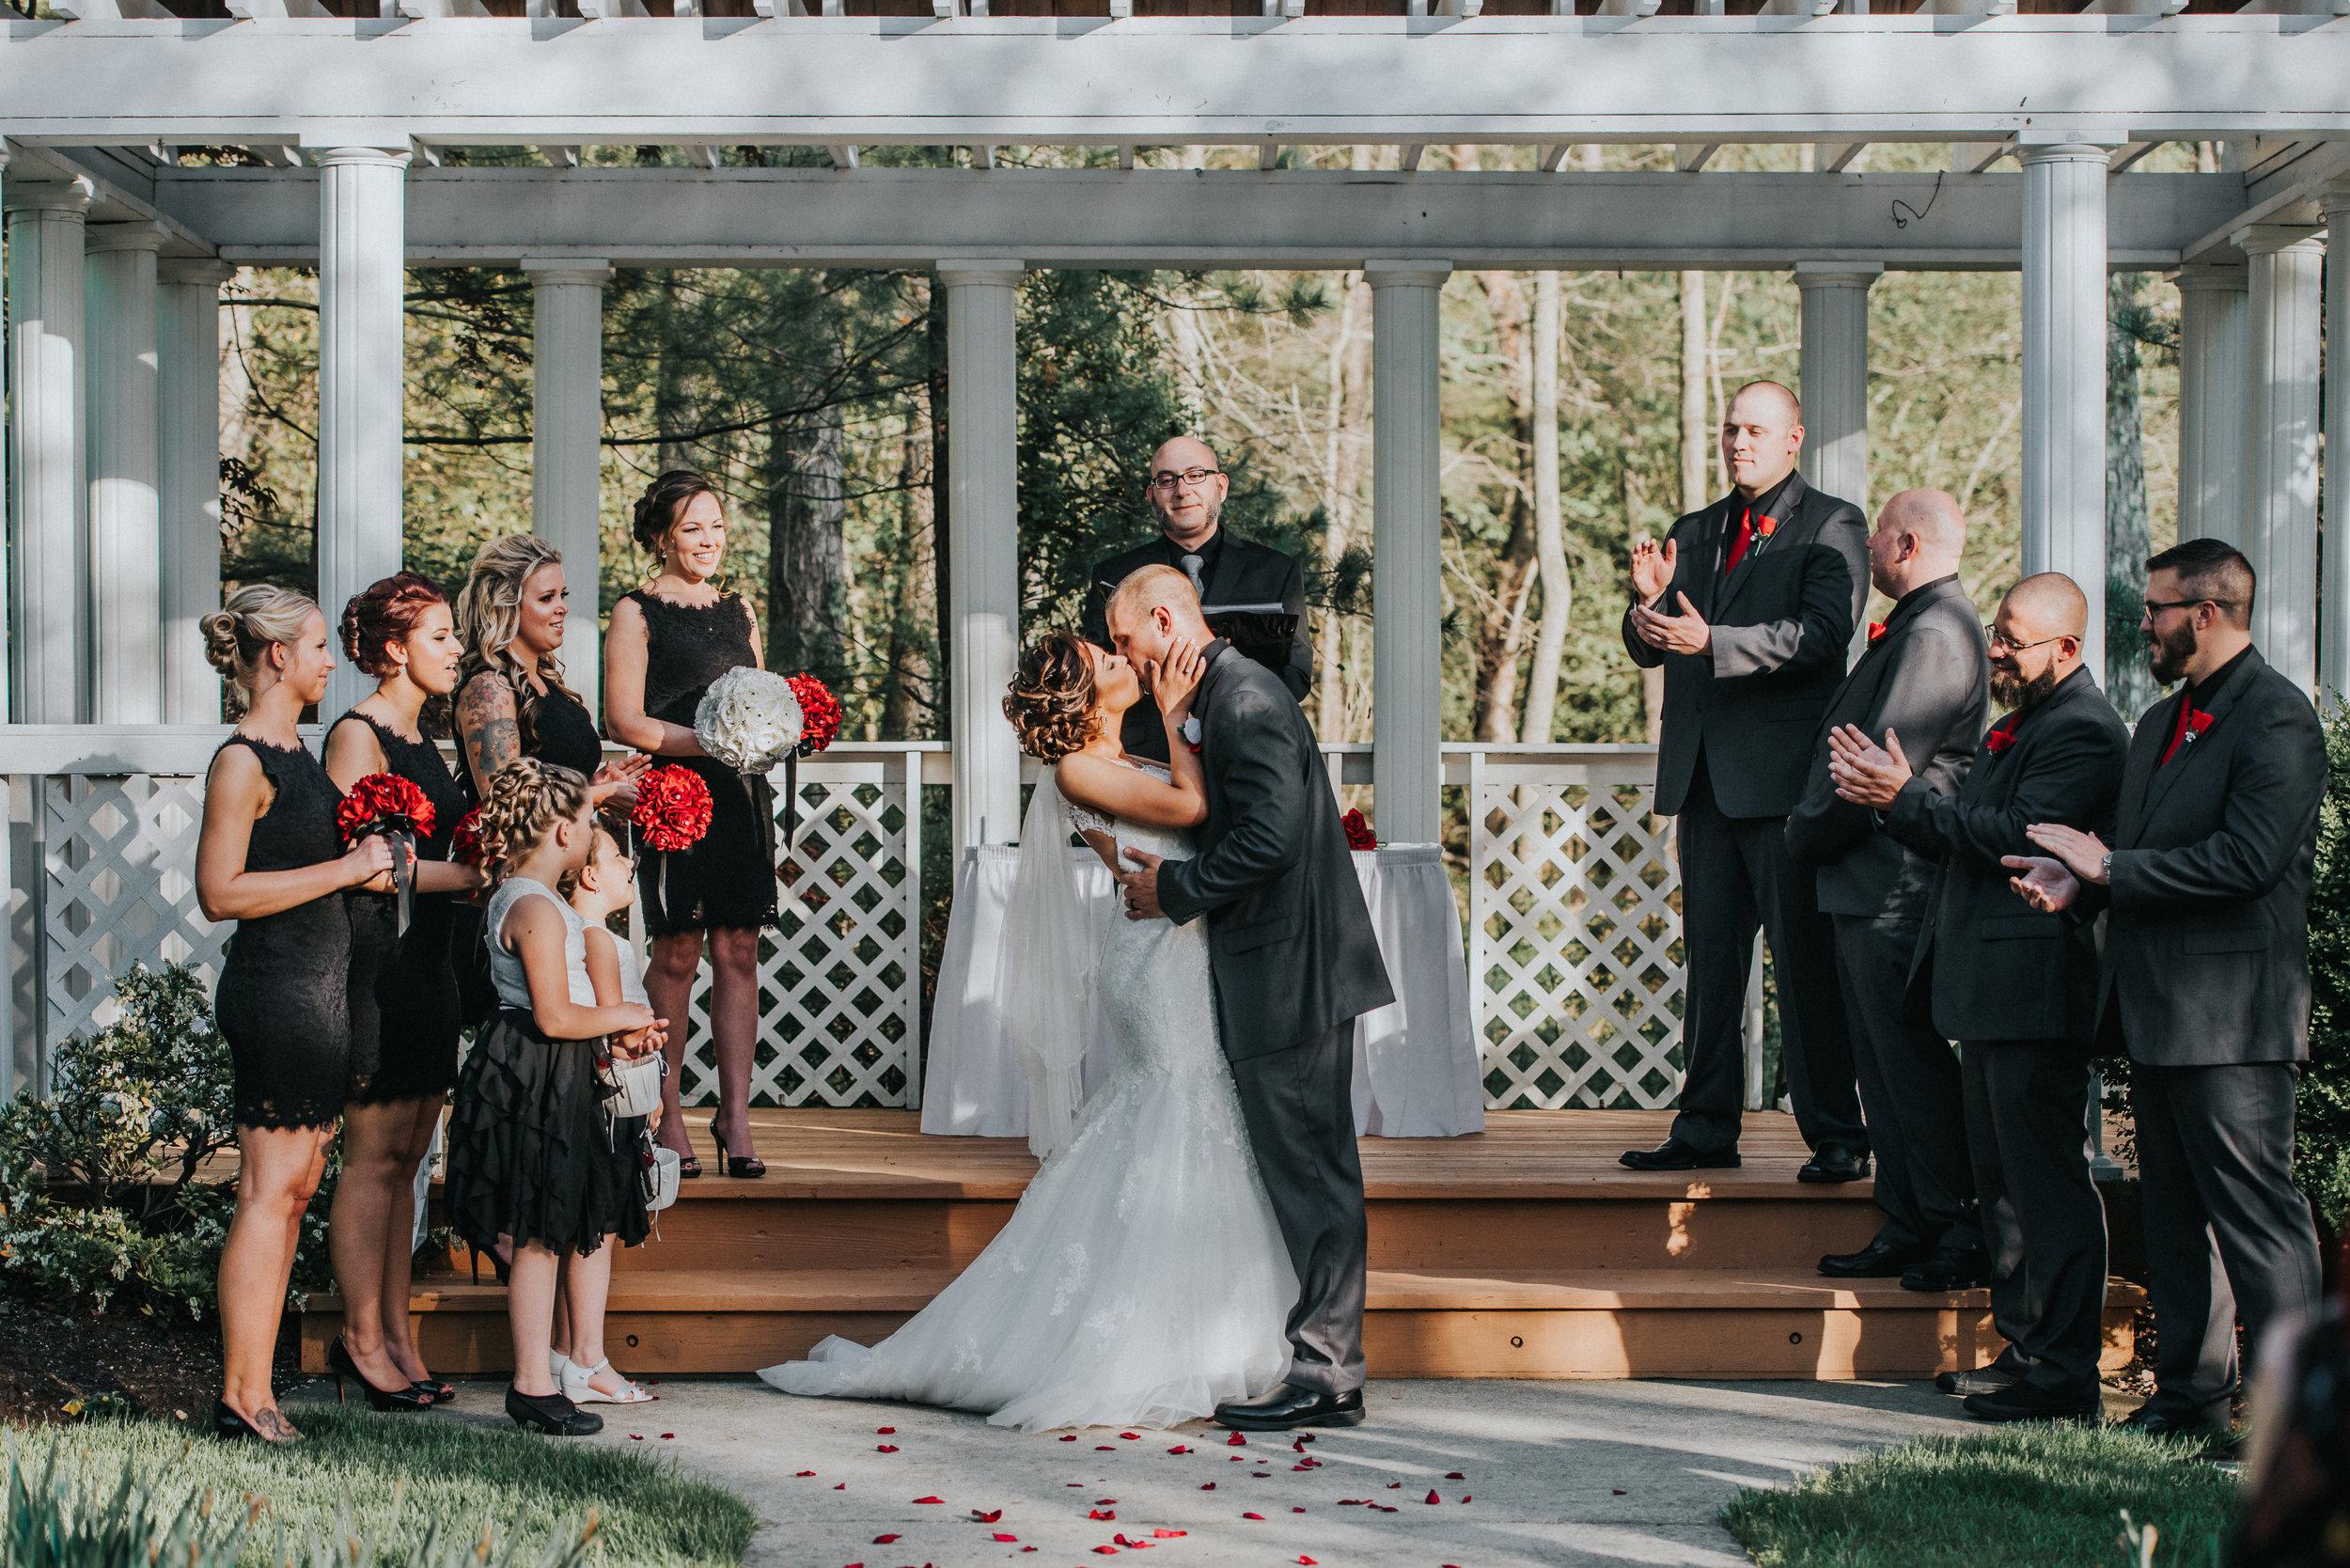 Christina-and-Gene-Wedding-Marla-Rain-Photography-353.jpg